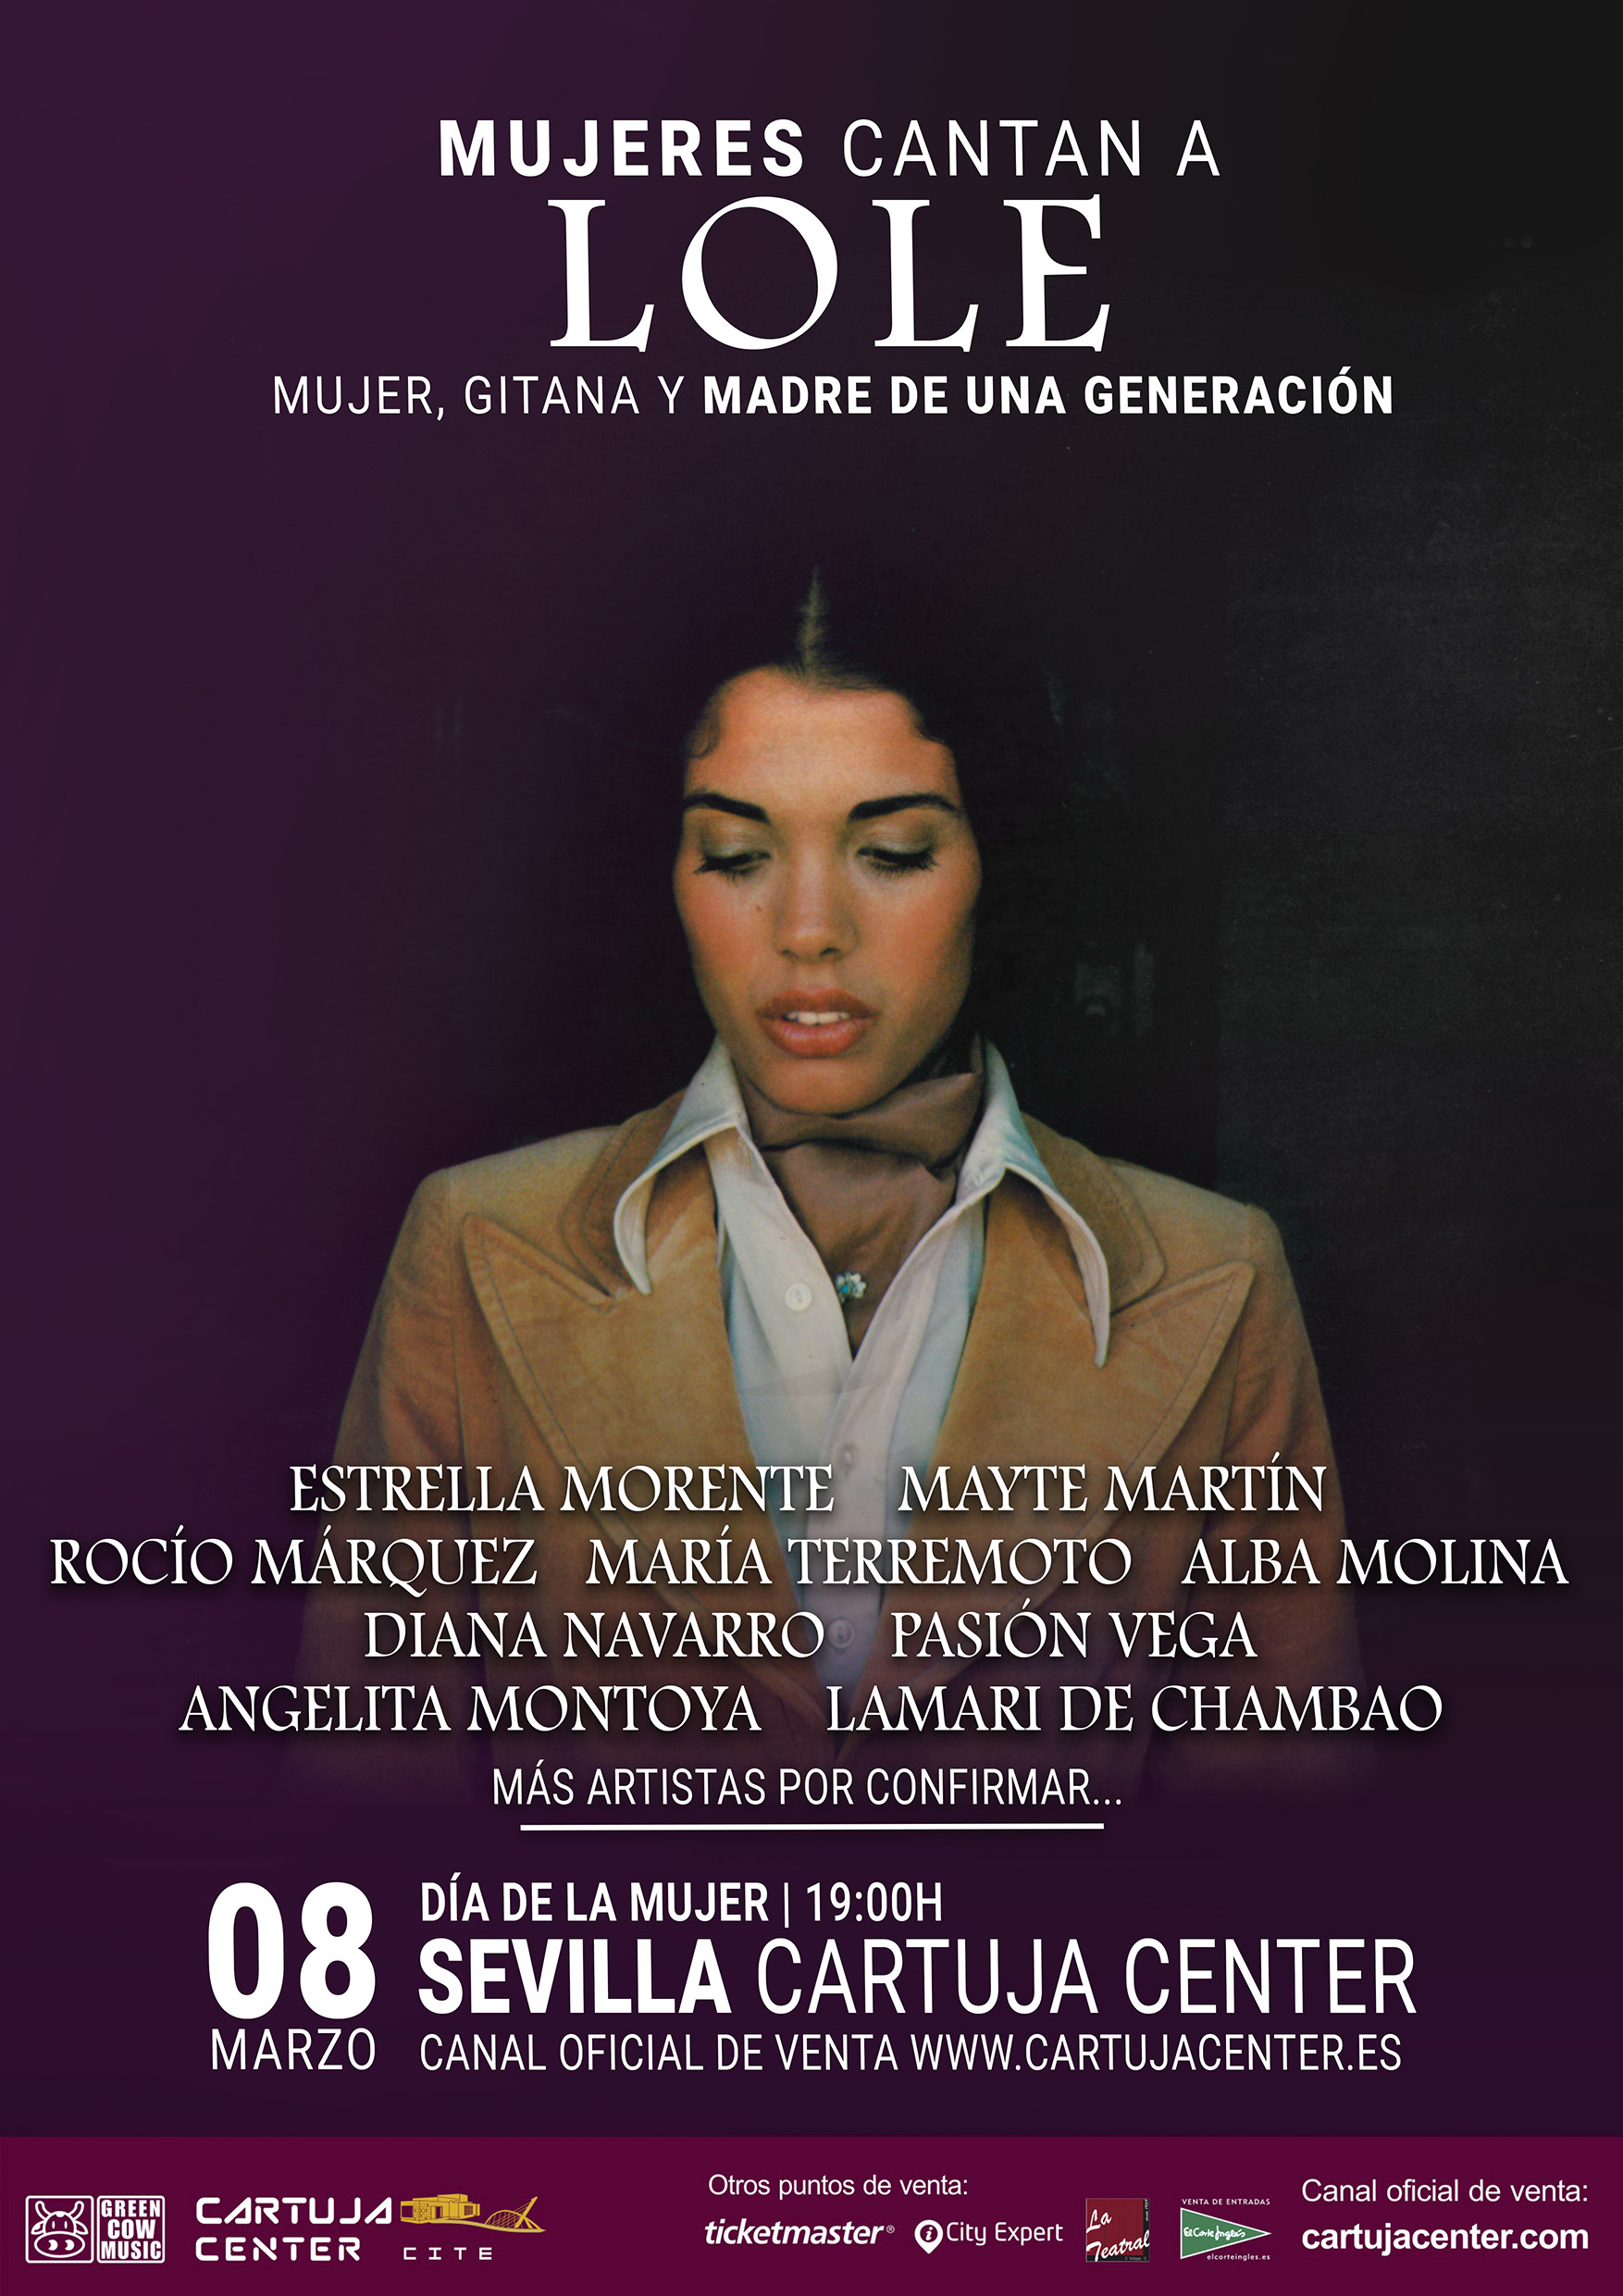 Cartuja Center acoge el homenaje a Lole Montoya, 'Mujeres cantan a Lole'